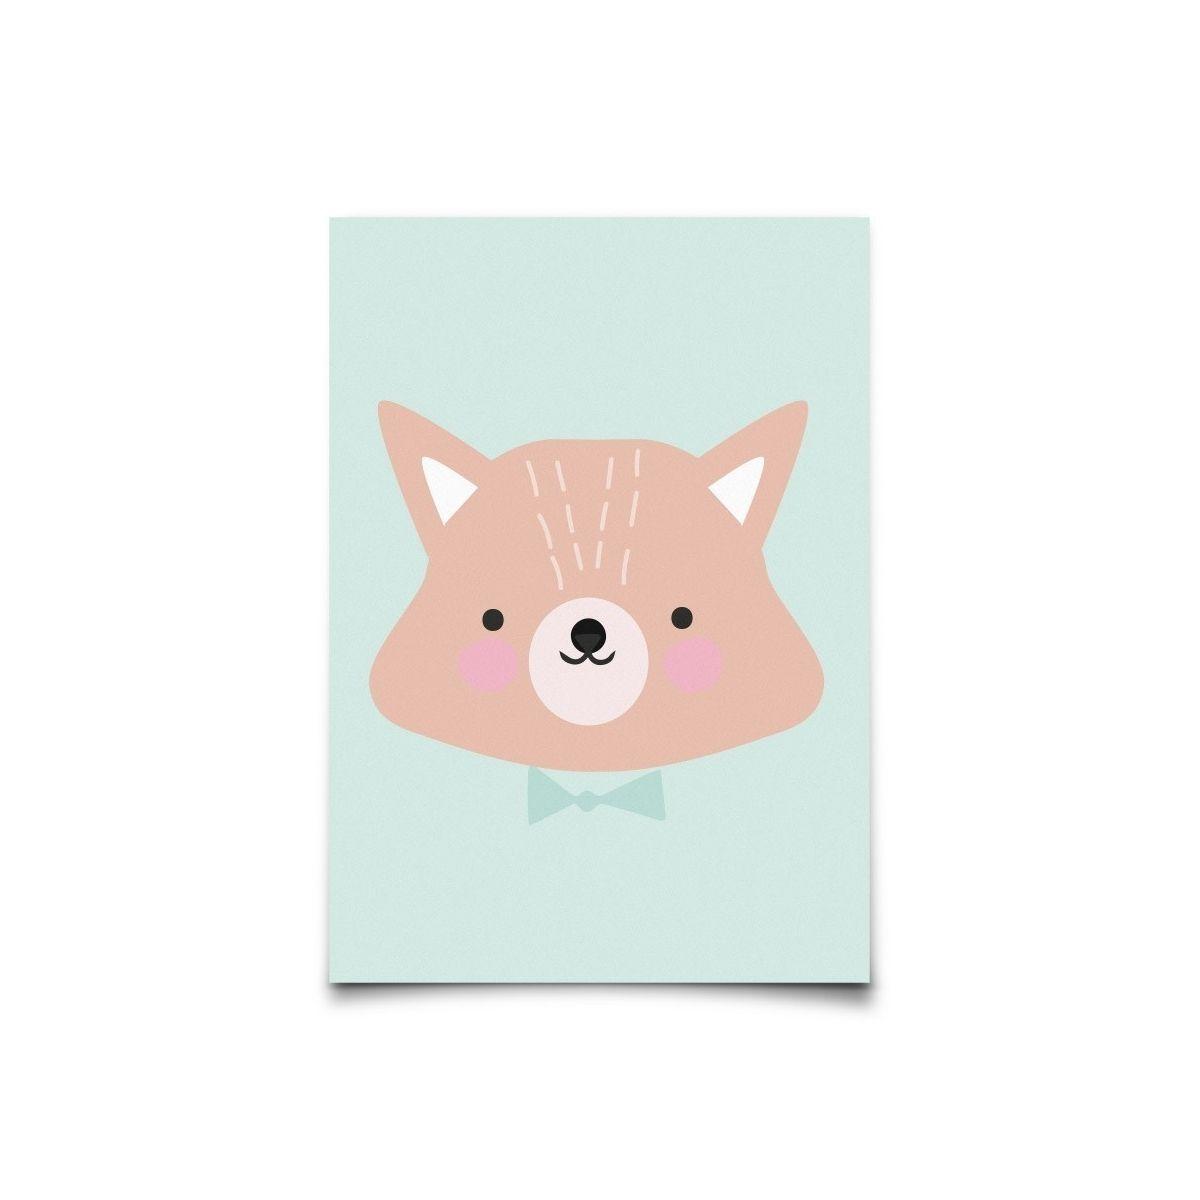 Eef Lillemor - Postcard Forrest Animals Mr. Fox - 1